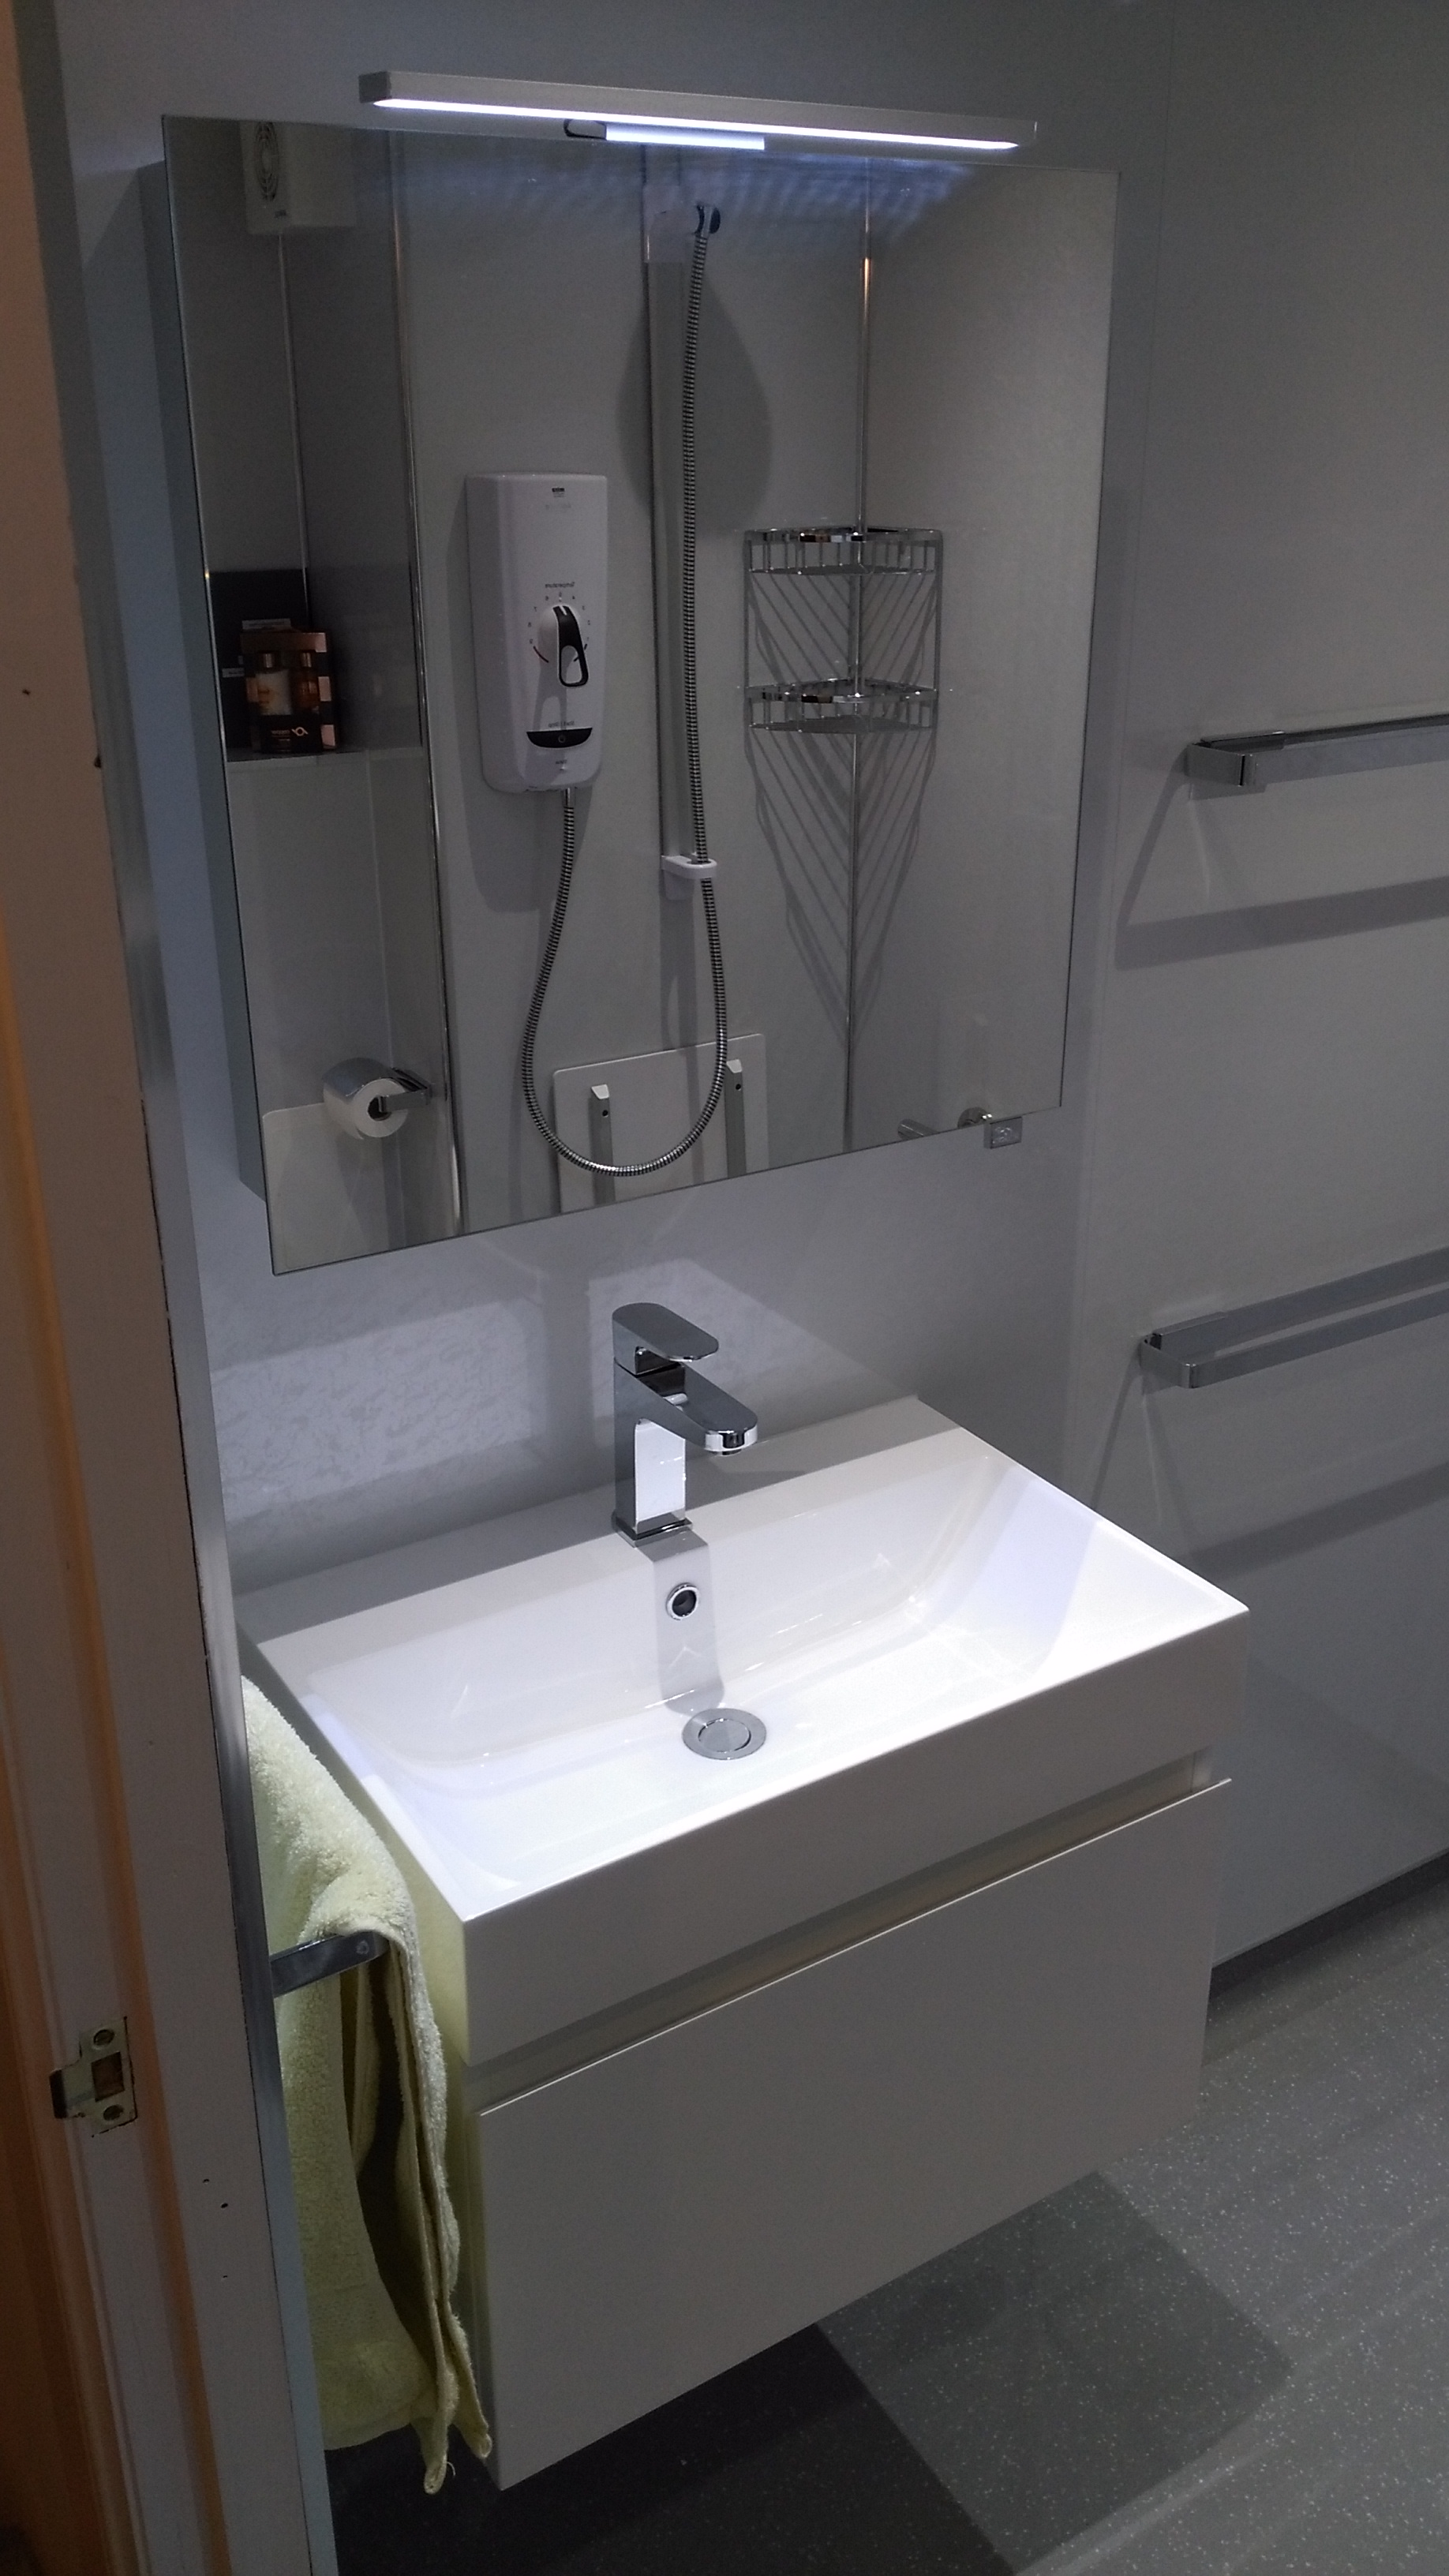 Bathroom Vanity Unit in white with Mirror storage above